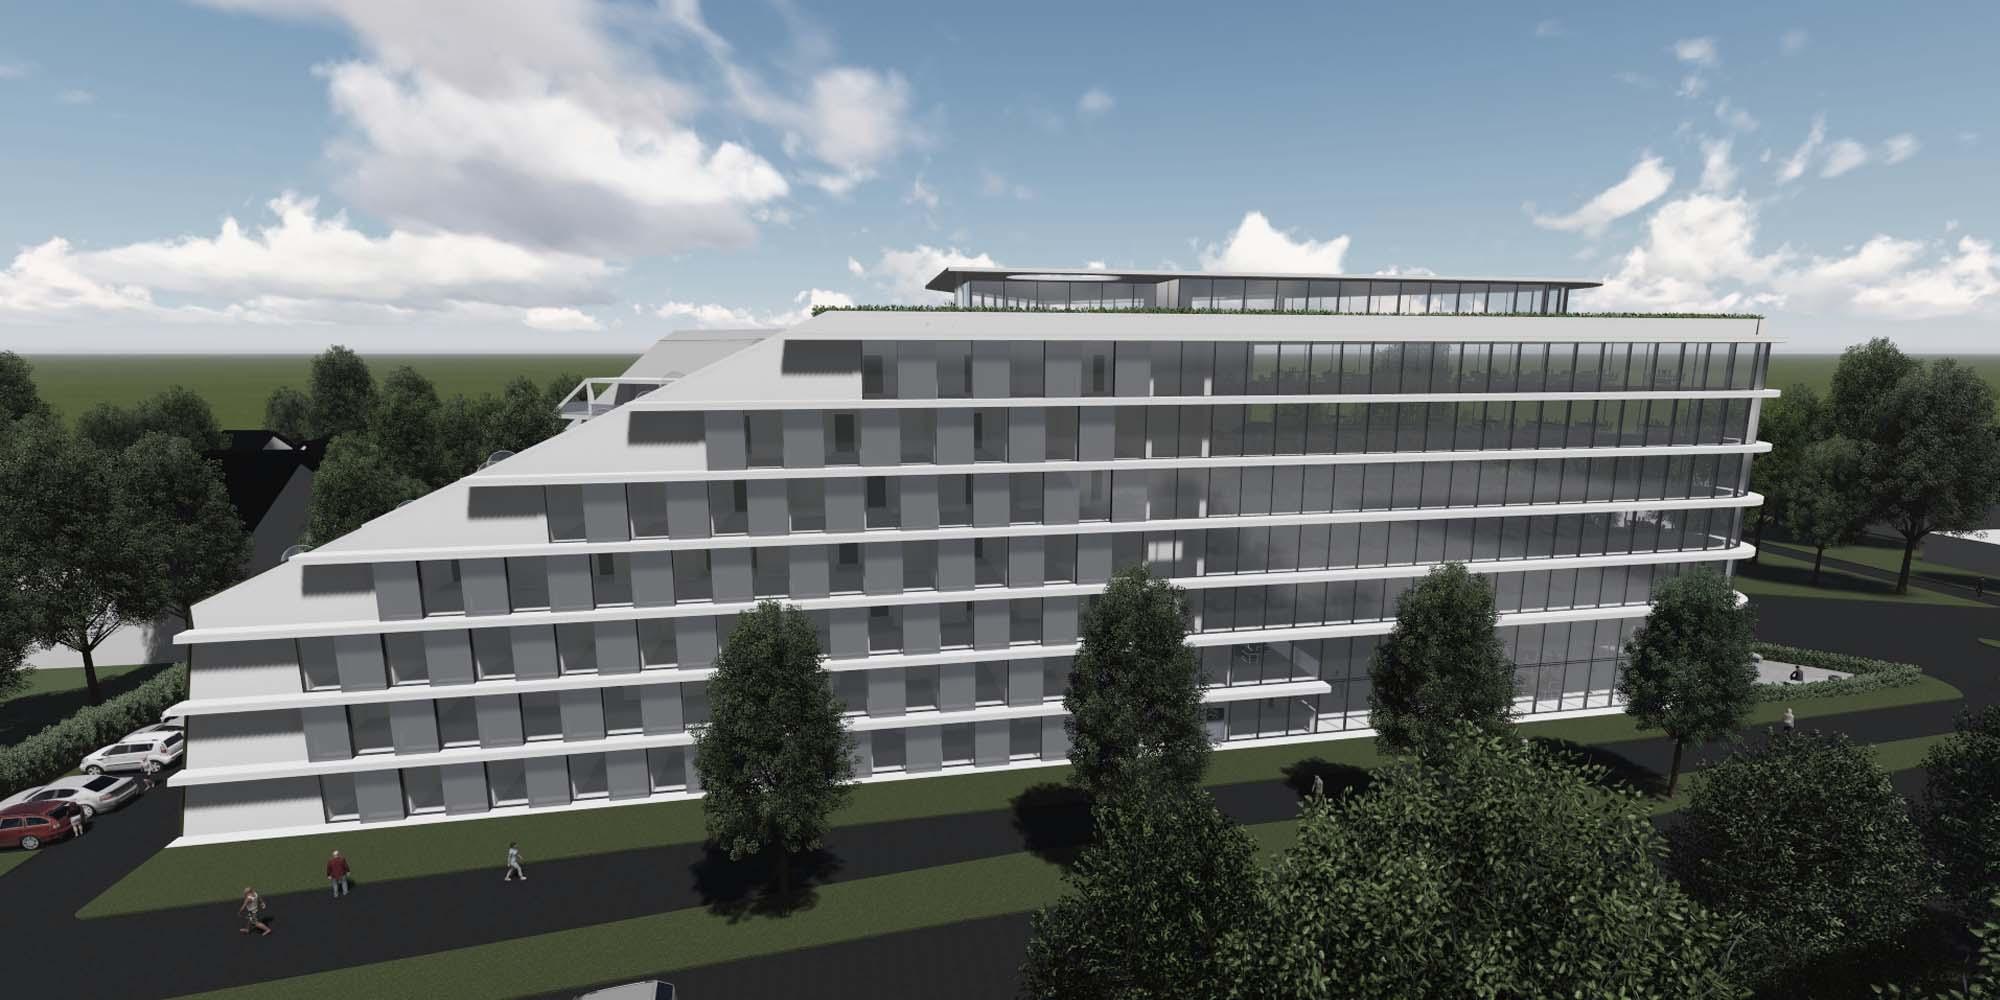 hotel und b rogeb ude germering architekturb ro hoffmann amtsberg. Black Bedroom Furniture Sets. Home Design Ideas